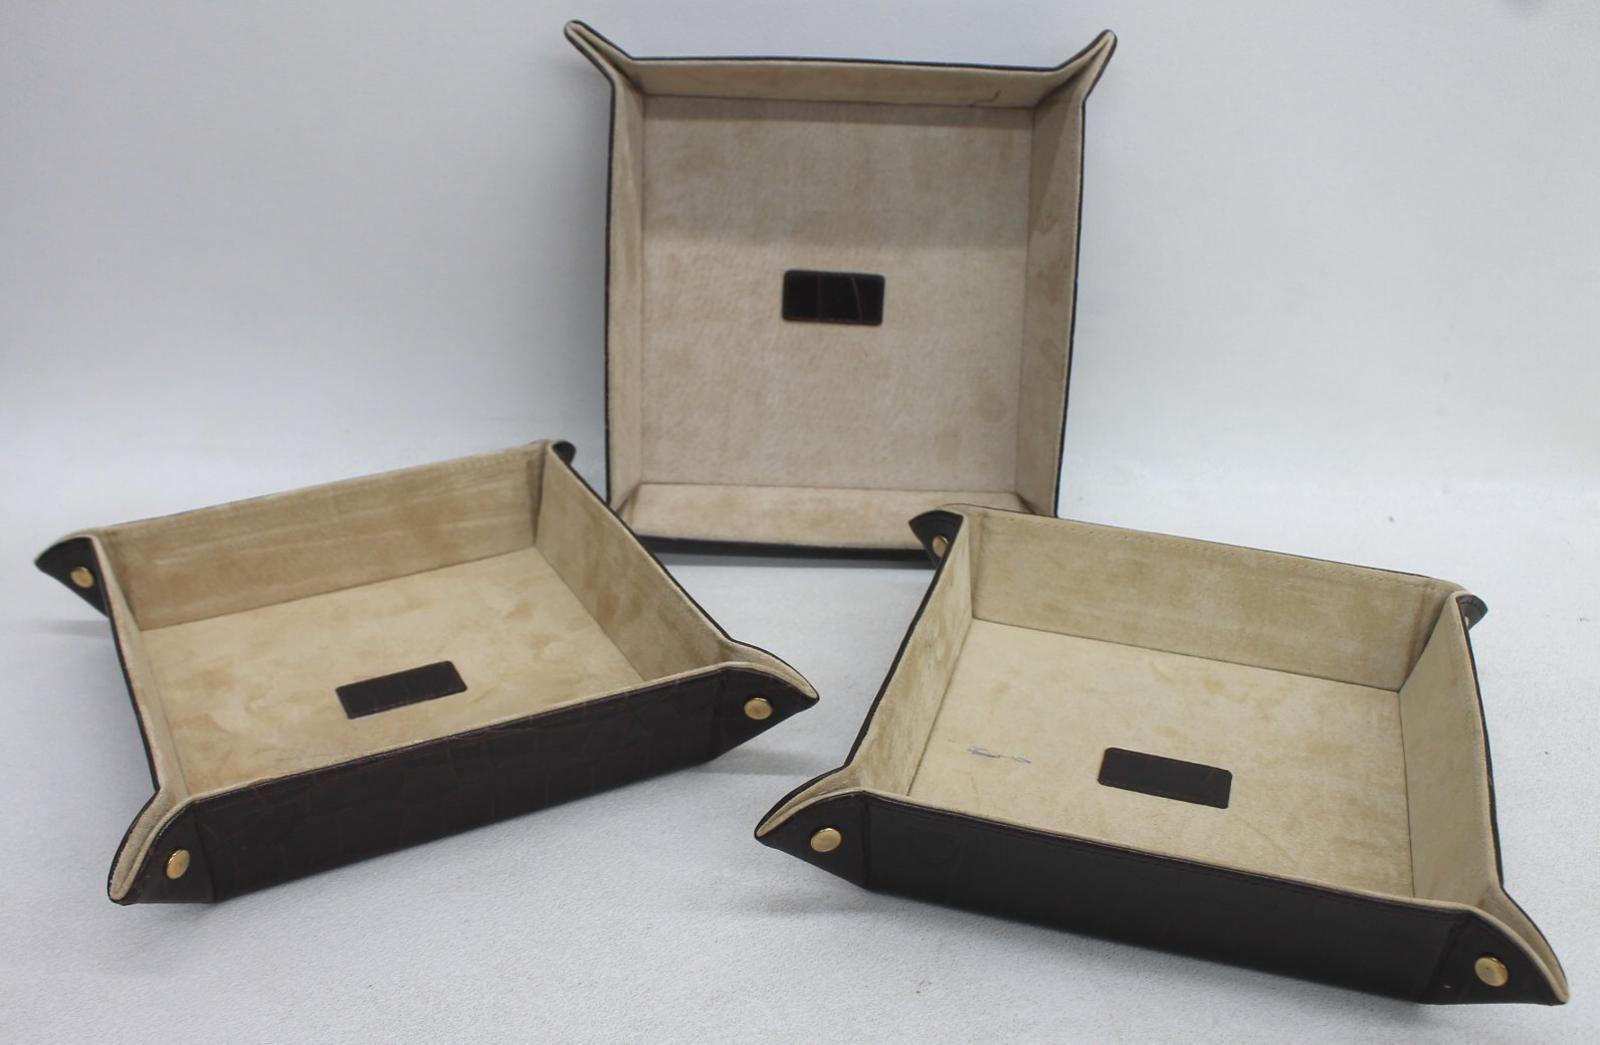 ASPINAL-OF-LONDON-Medium-Mahogany-Croc-Print-Leather-Tidy-Tray-Trinket-Holder-3x